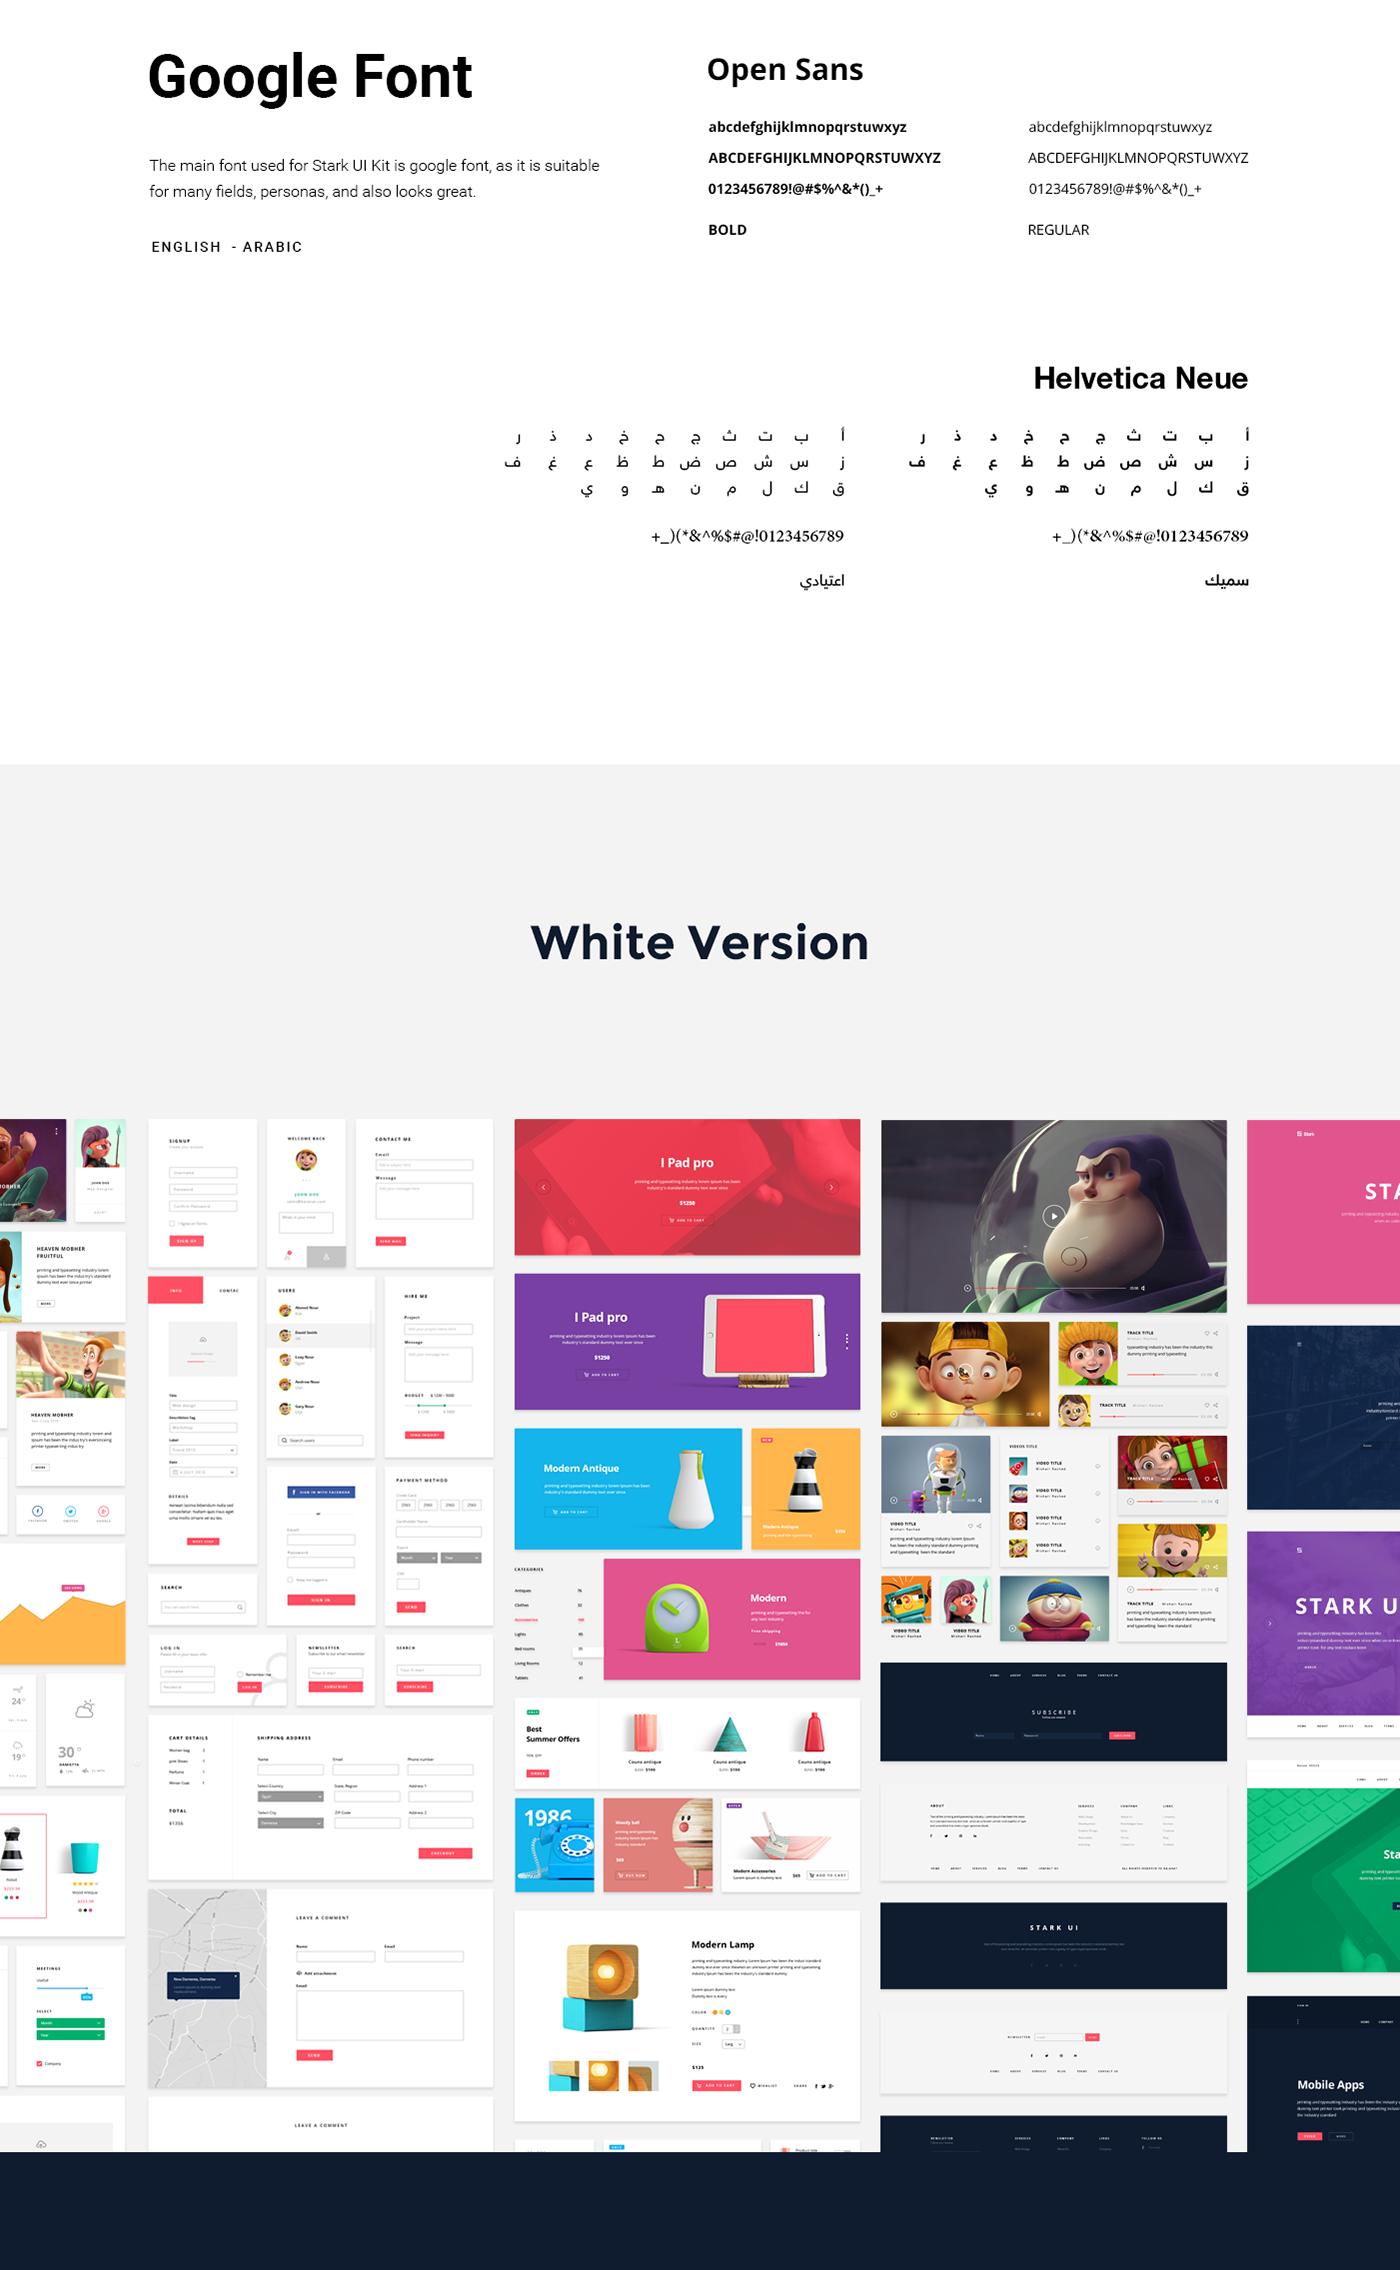 UI ui kit web parts icons free ui kit free icons free design components graphics elements